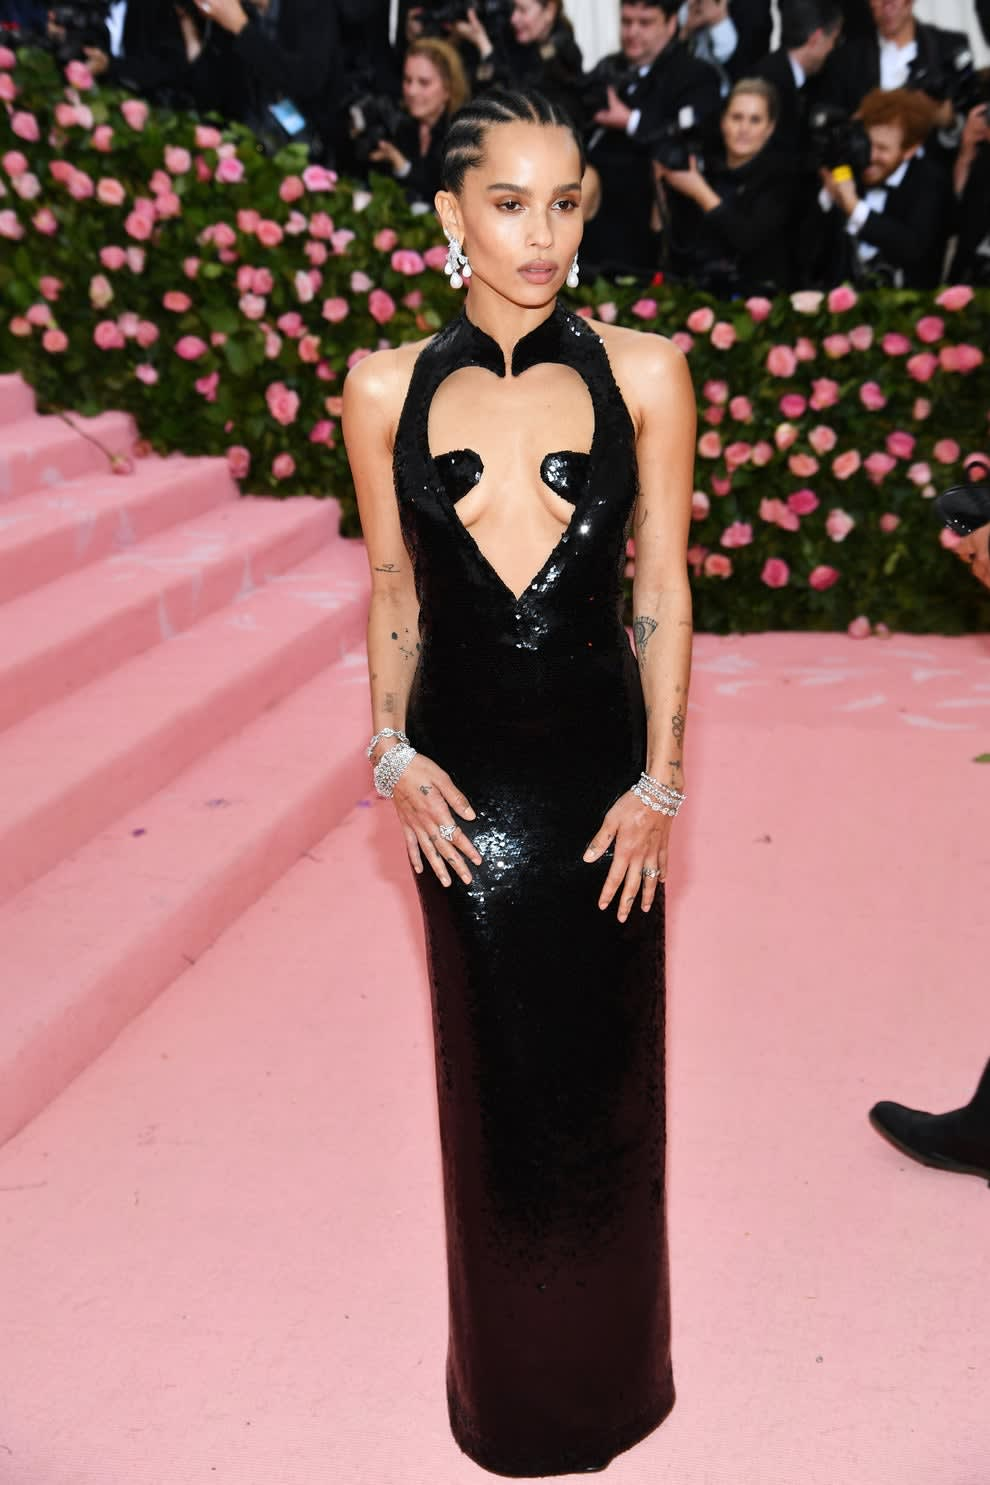 Zoe at Met Gala in long black sequin gown